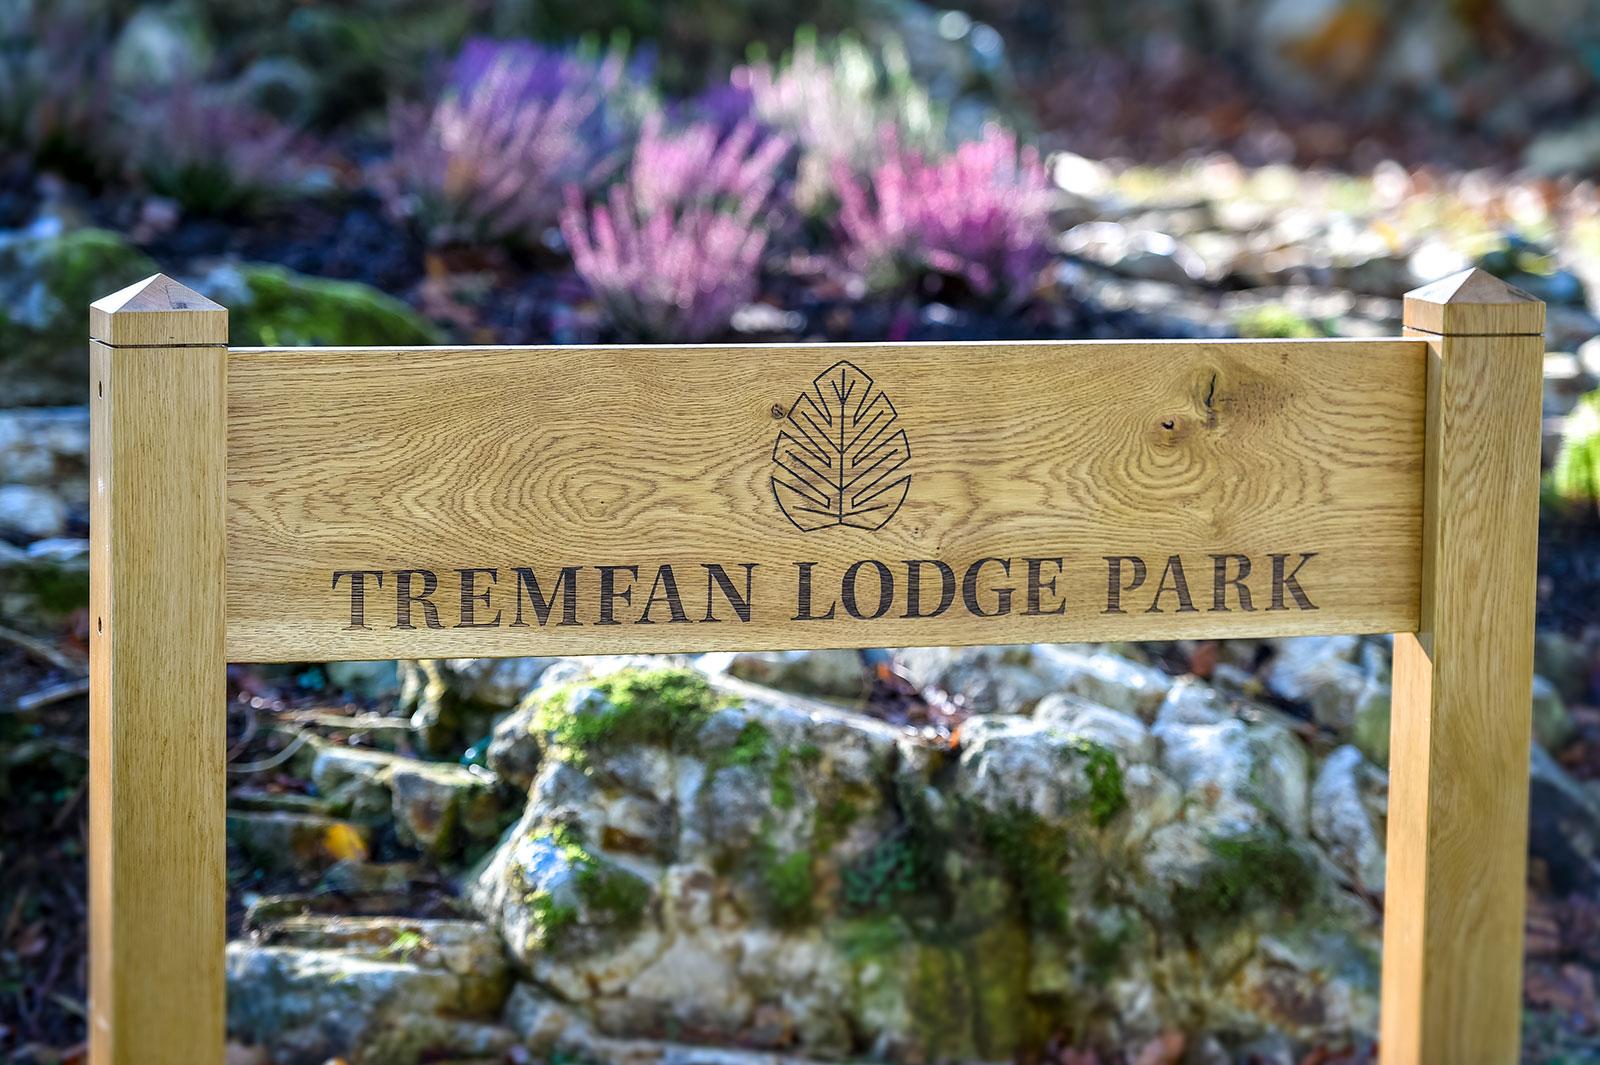 Tremfan Lodge Park sign